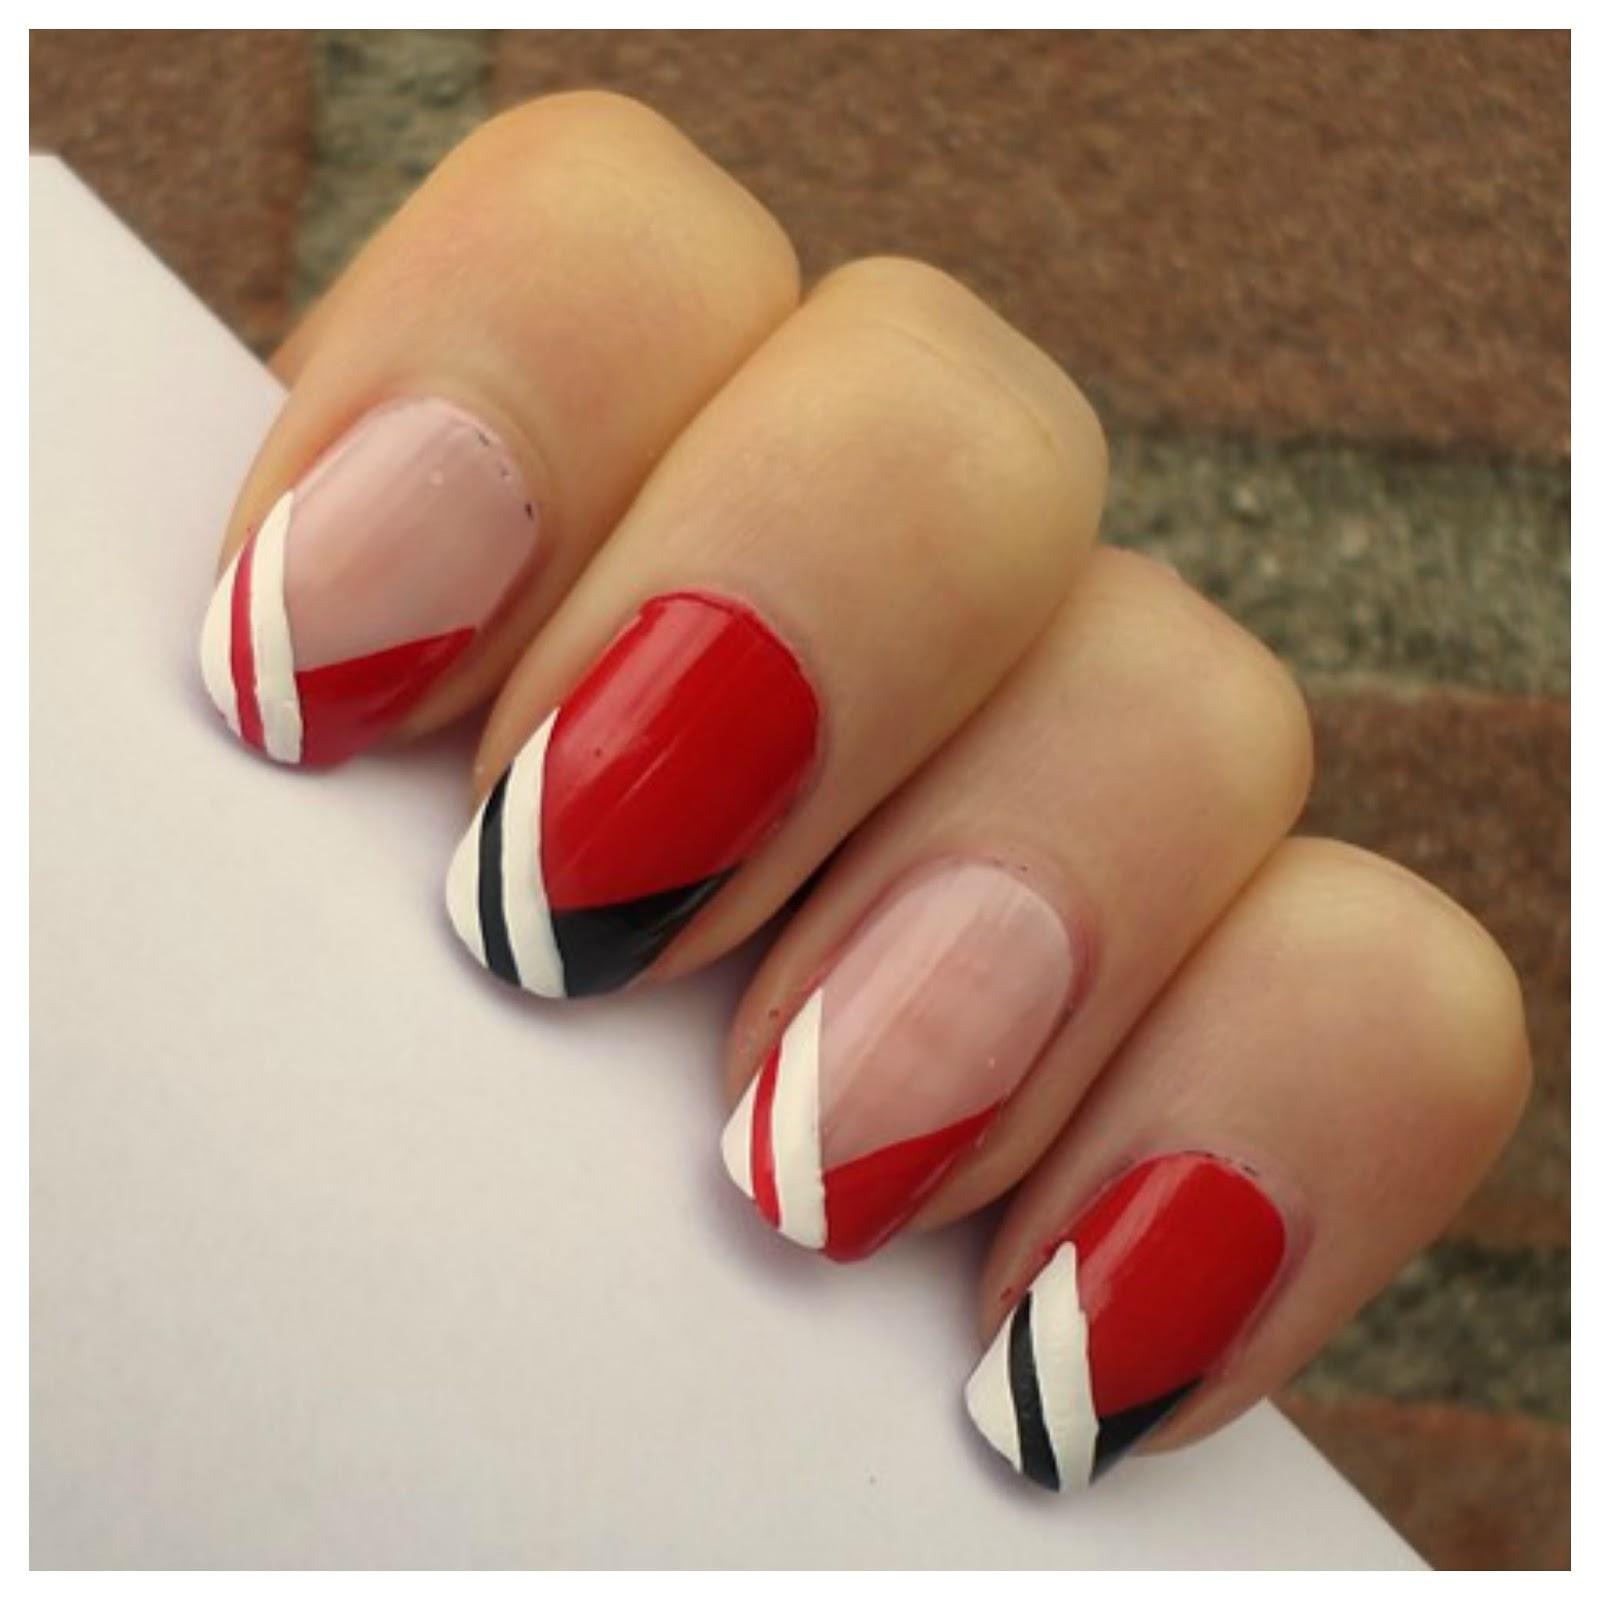 Creativenails4fun Nail Art Red French Manicure